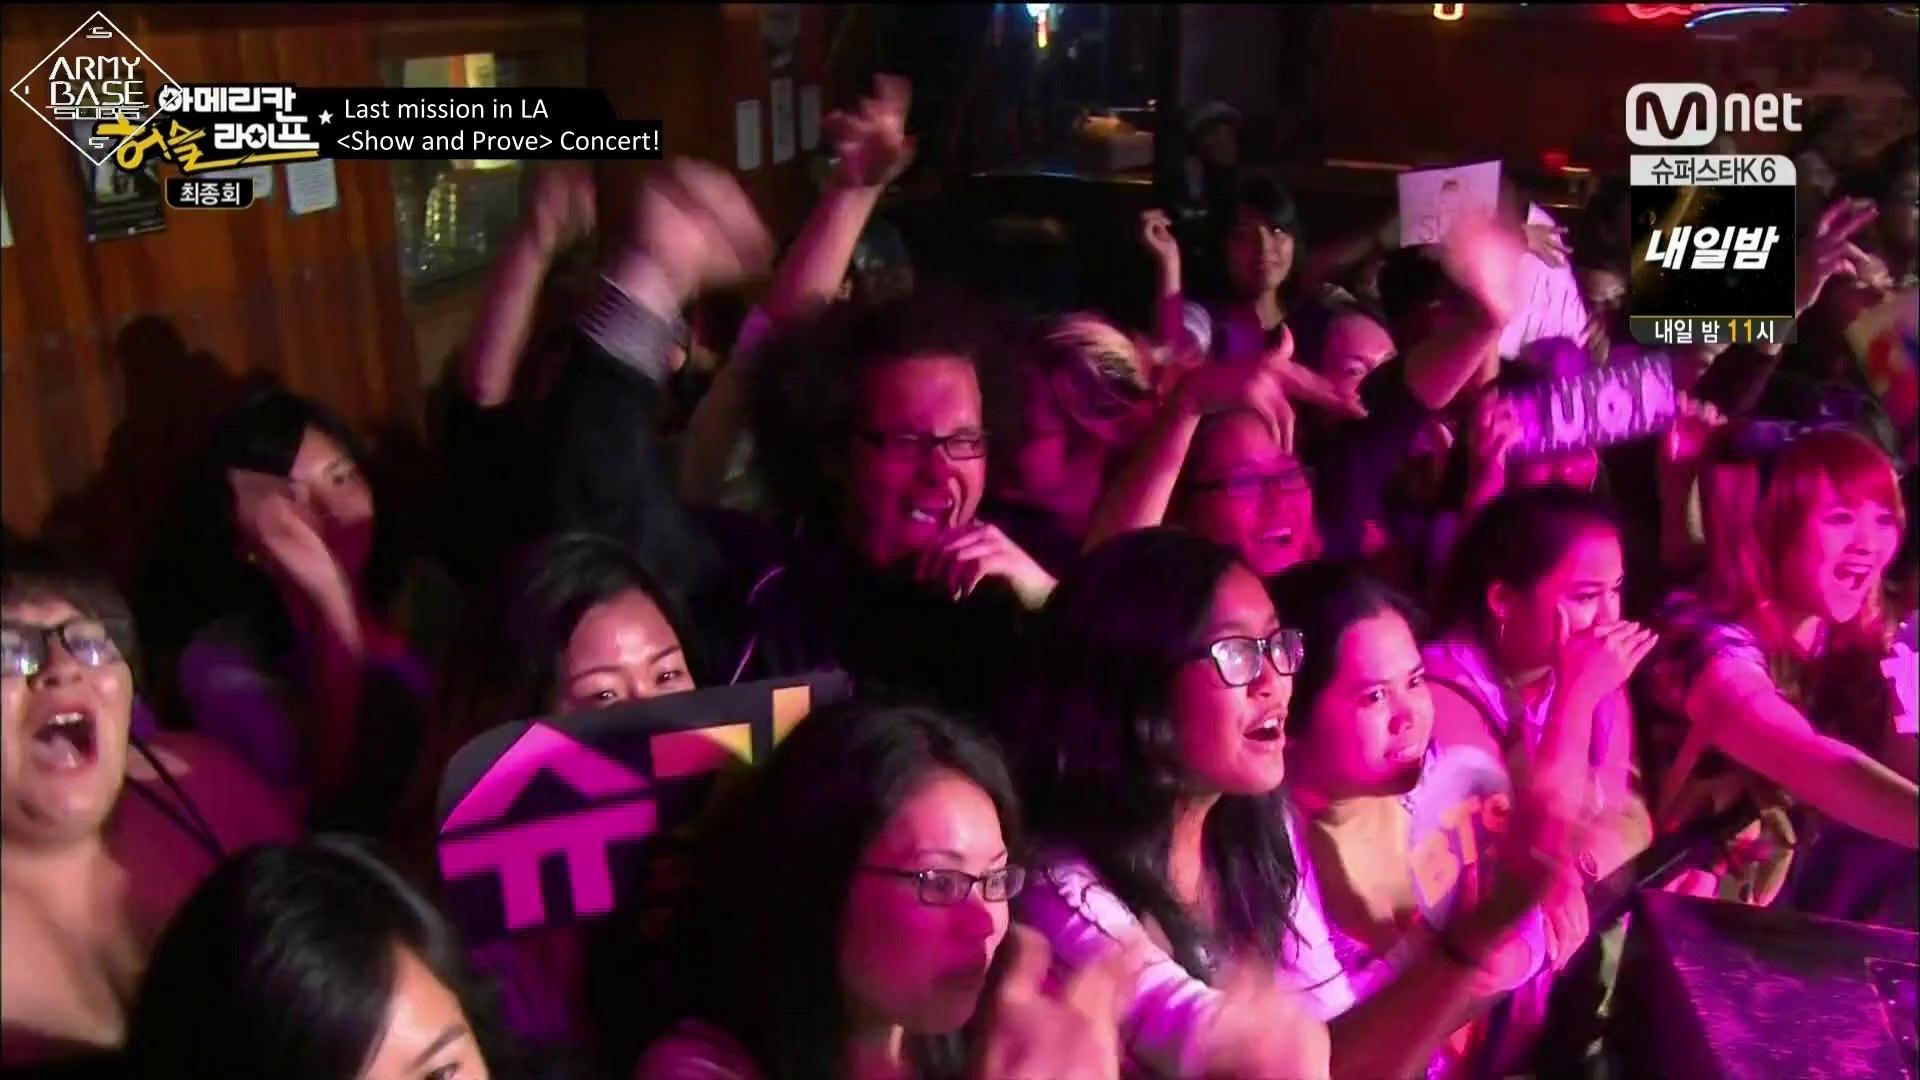 [ENG] 140911 BTS American Hustle Life Episode 8 | ABS